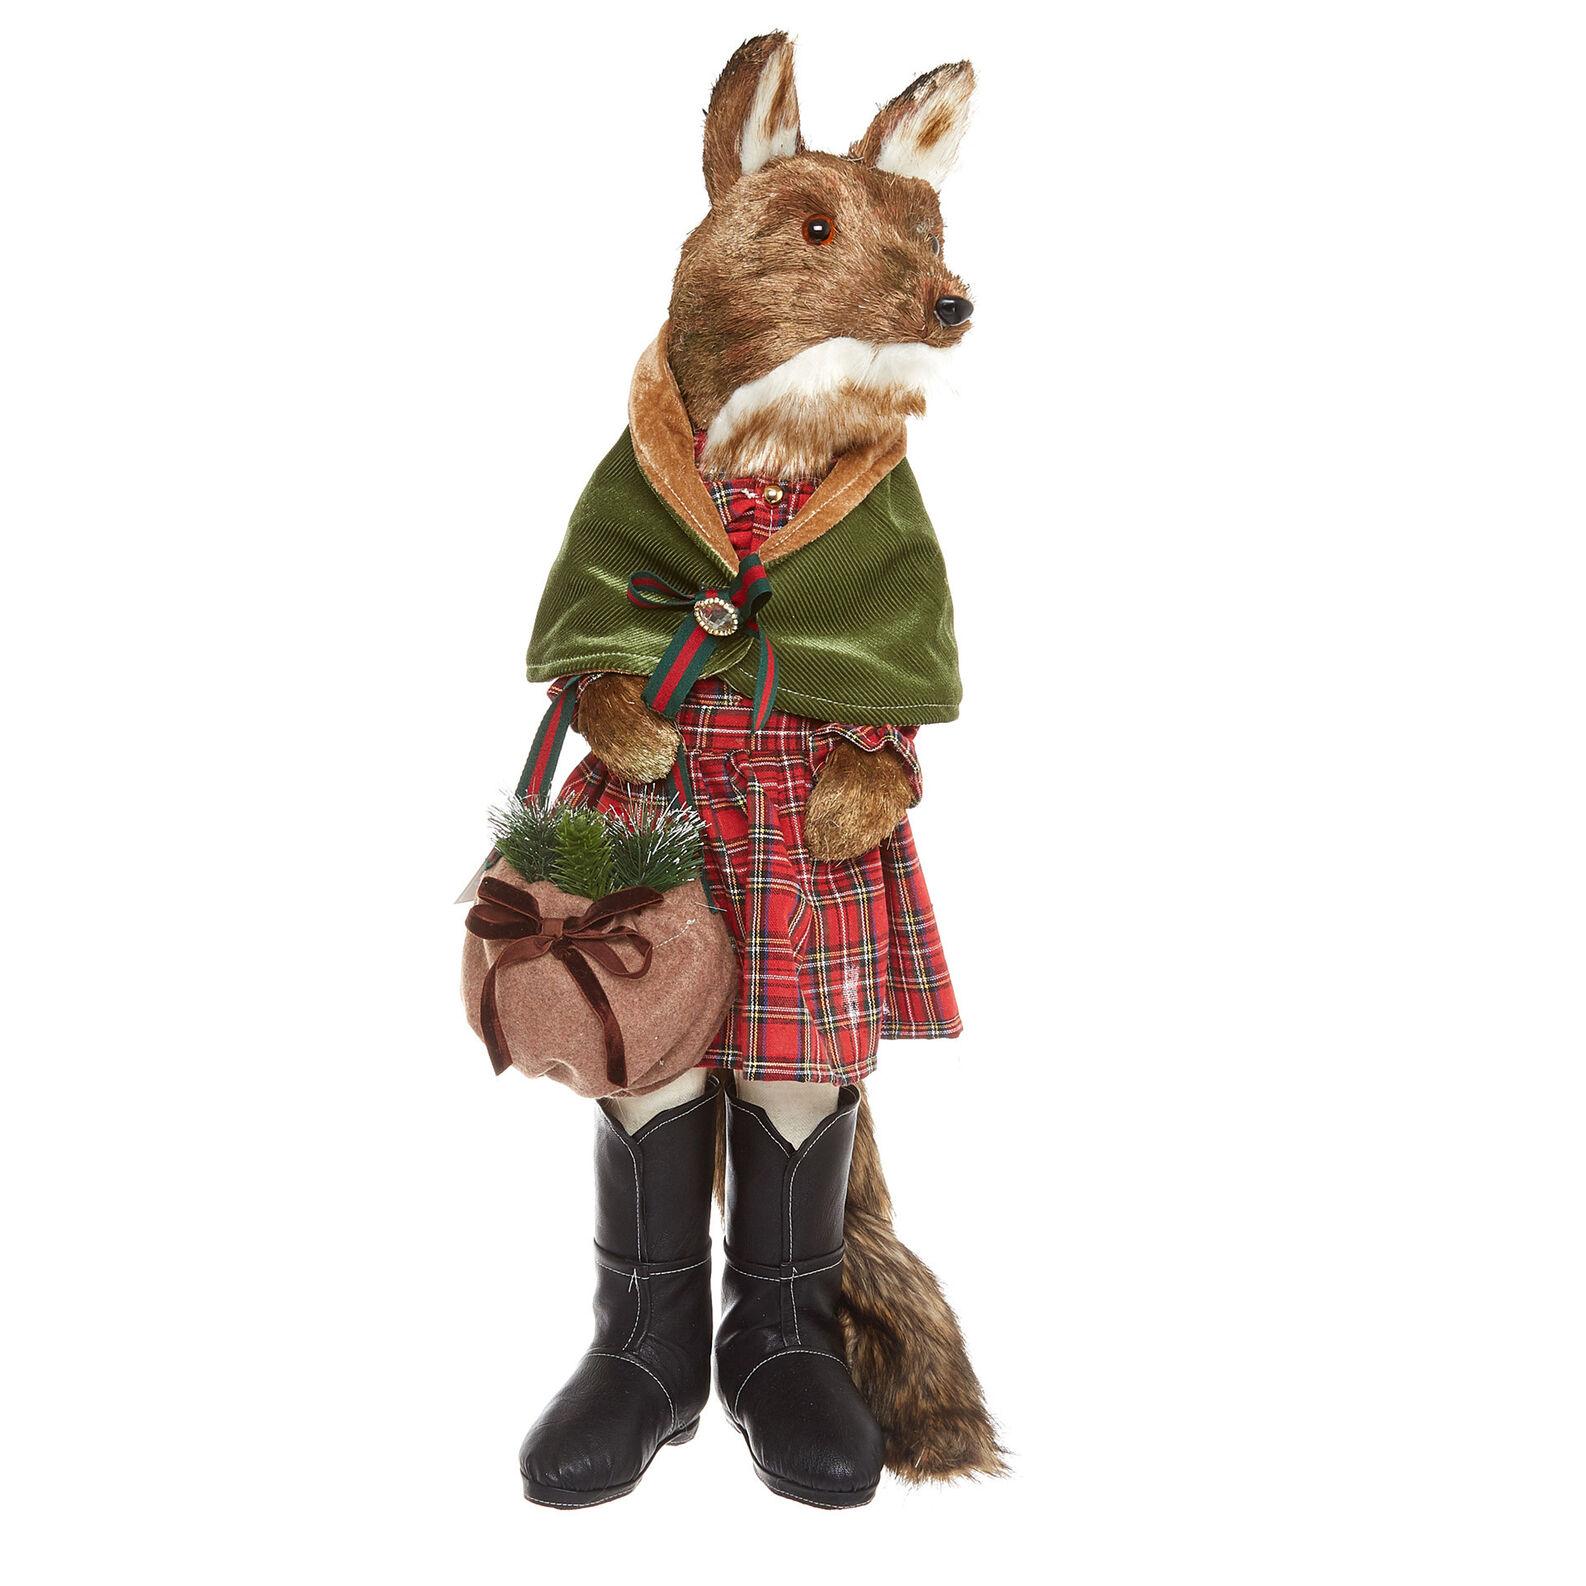 Decorative fox hand-made